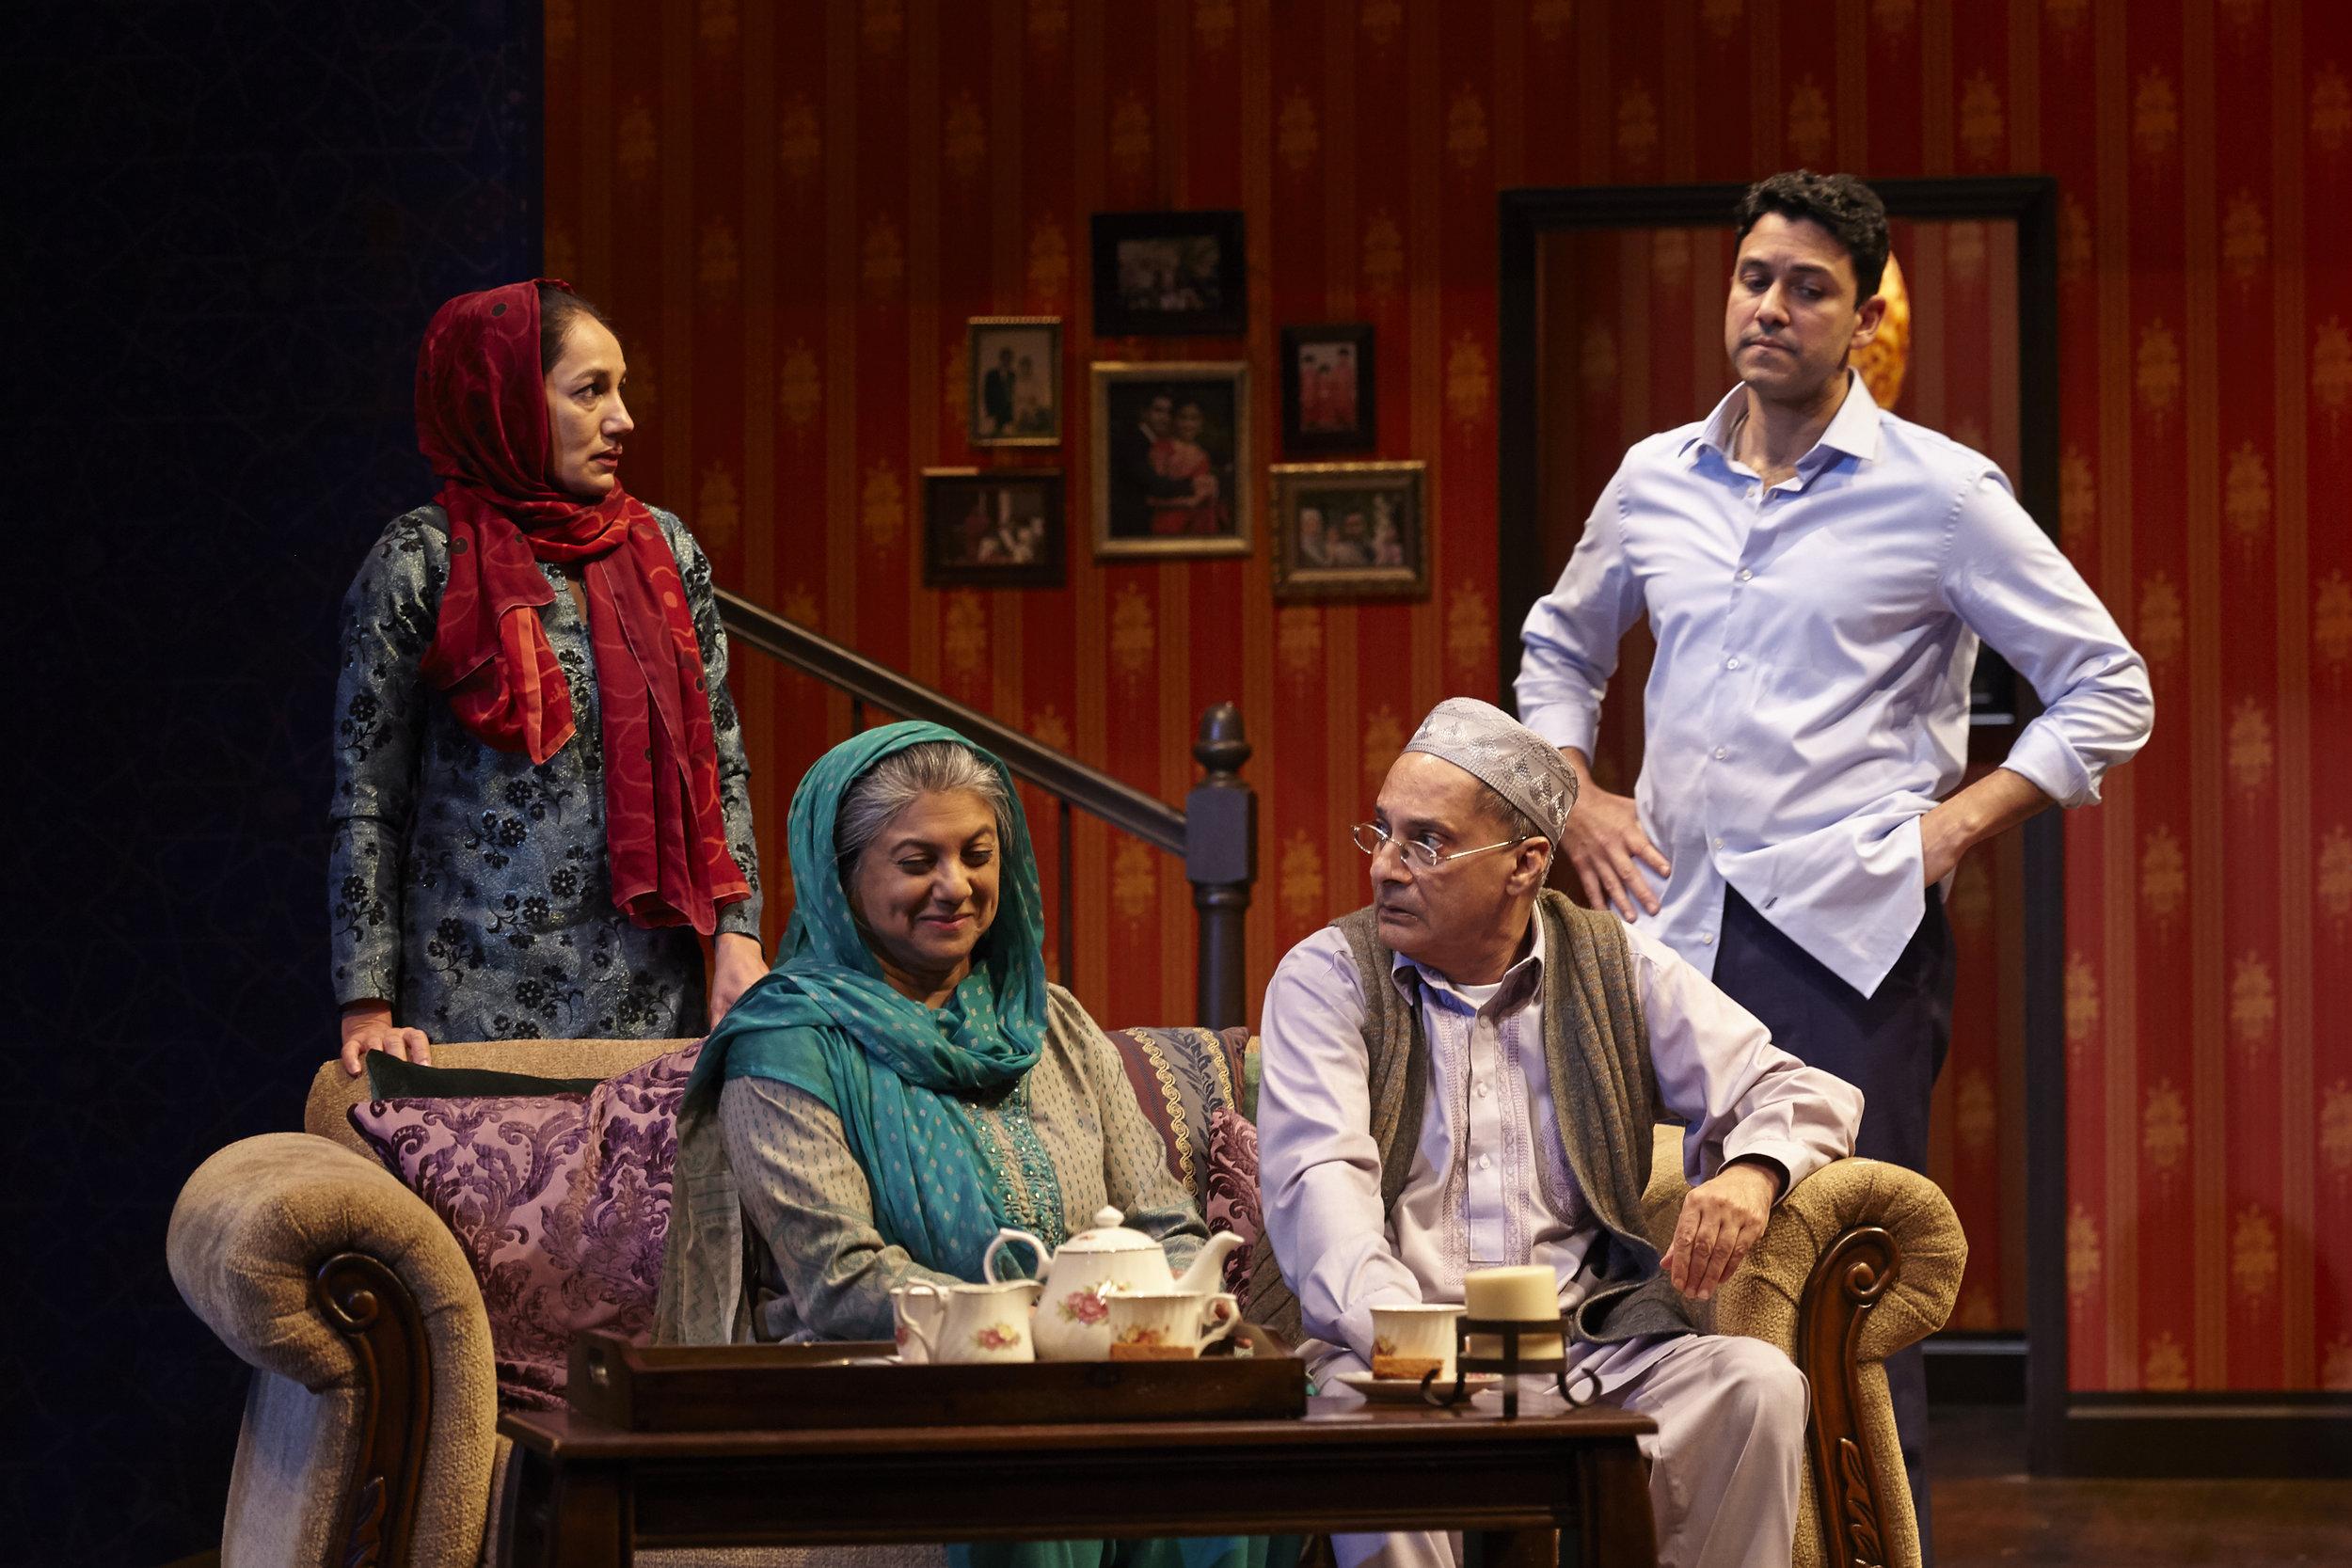 Purva Bedi, Rita Wolf, Ranjit Chowdhry and Sanjit De Silva in AN ORDINARY MUSLIM at New York Theatre Workshop - photo by Suzi Sadler.jpg